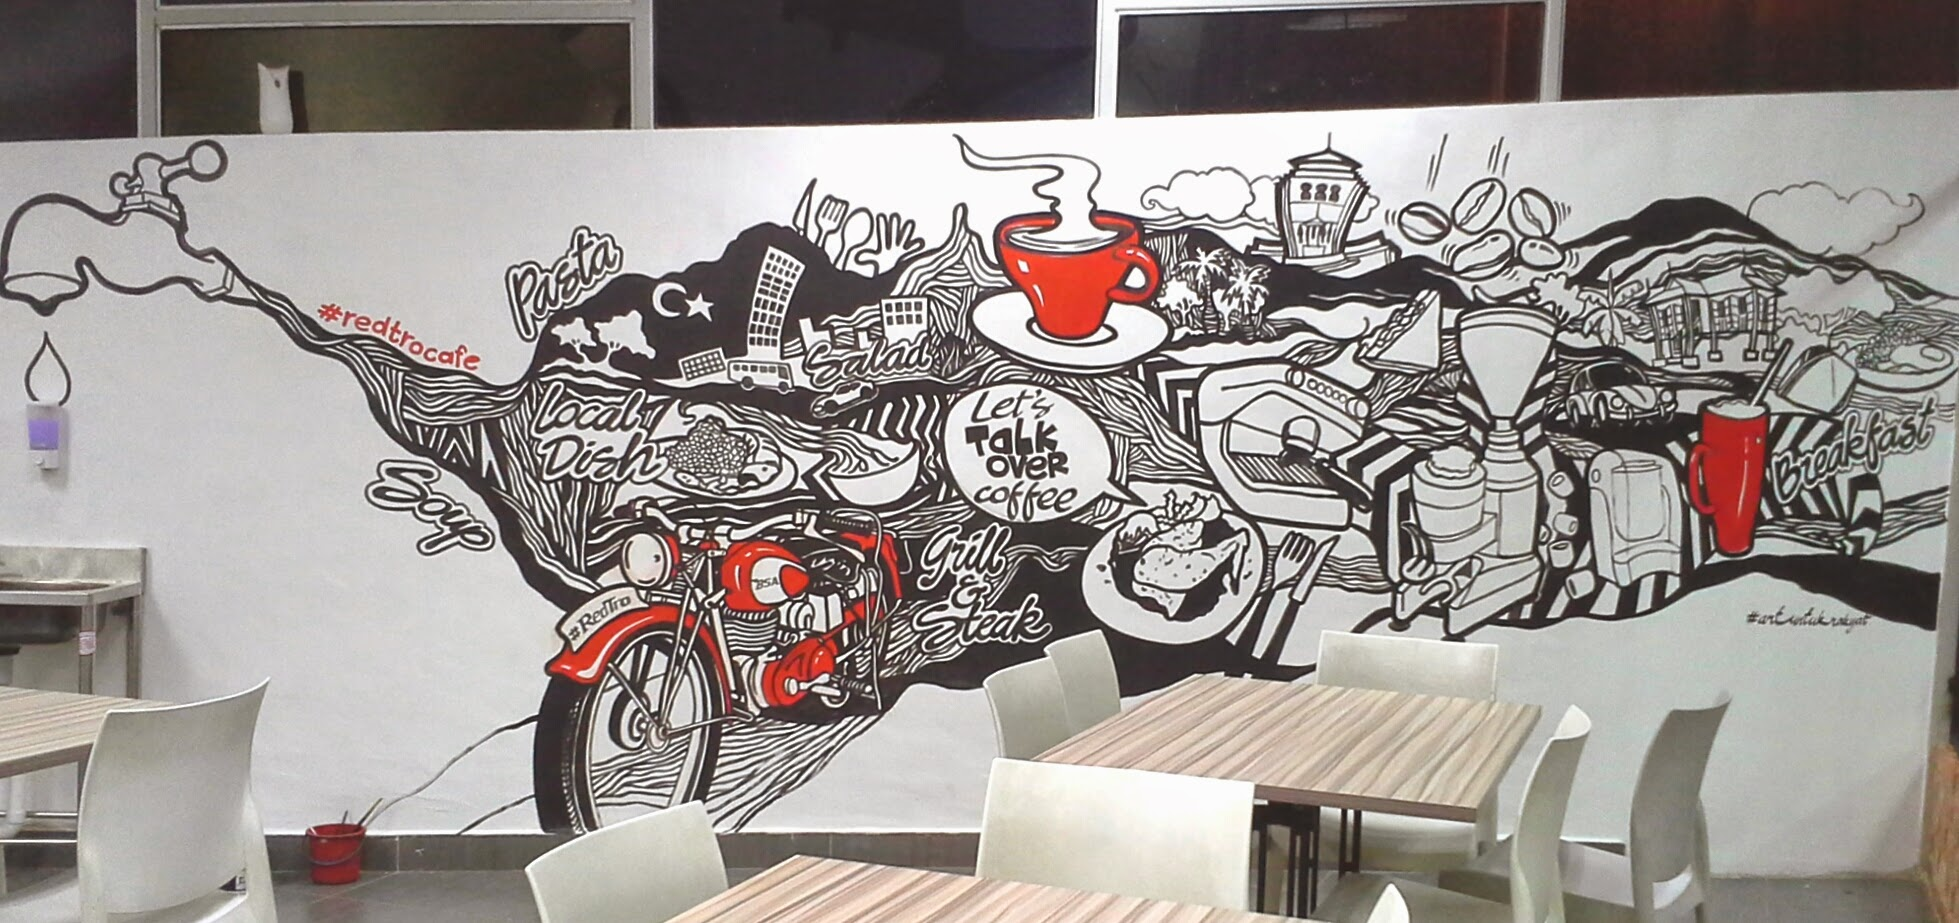 Aur fine art studio mural doodle redtro cafe medini6 for Mural untuk cafe